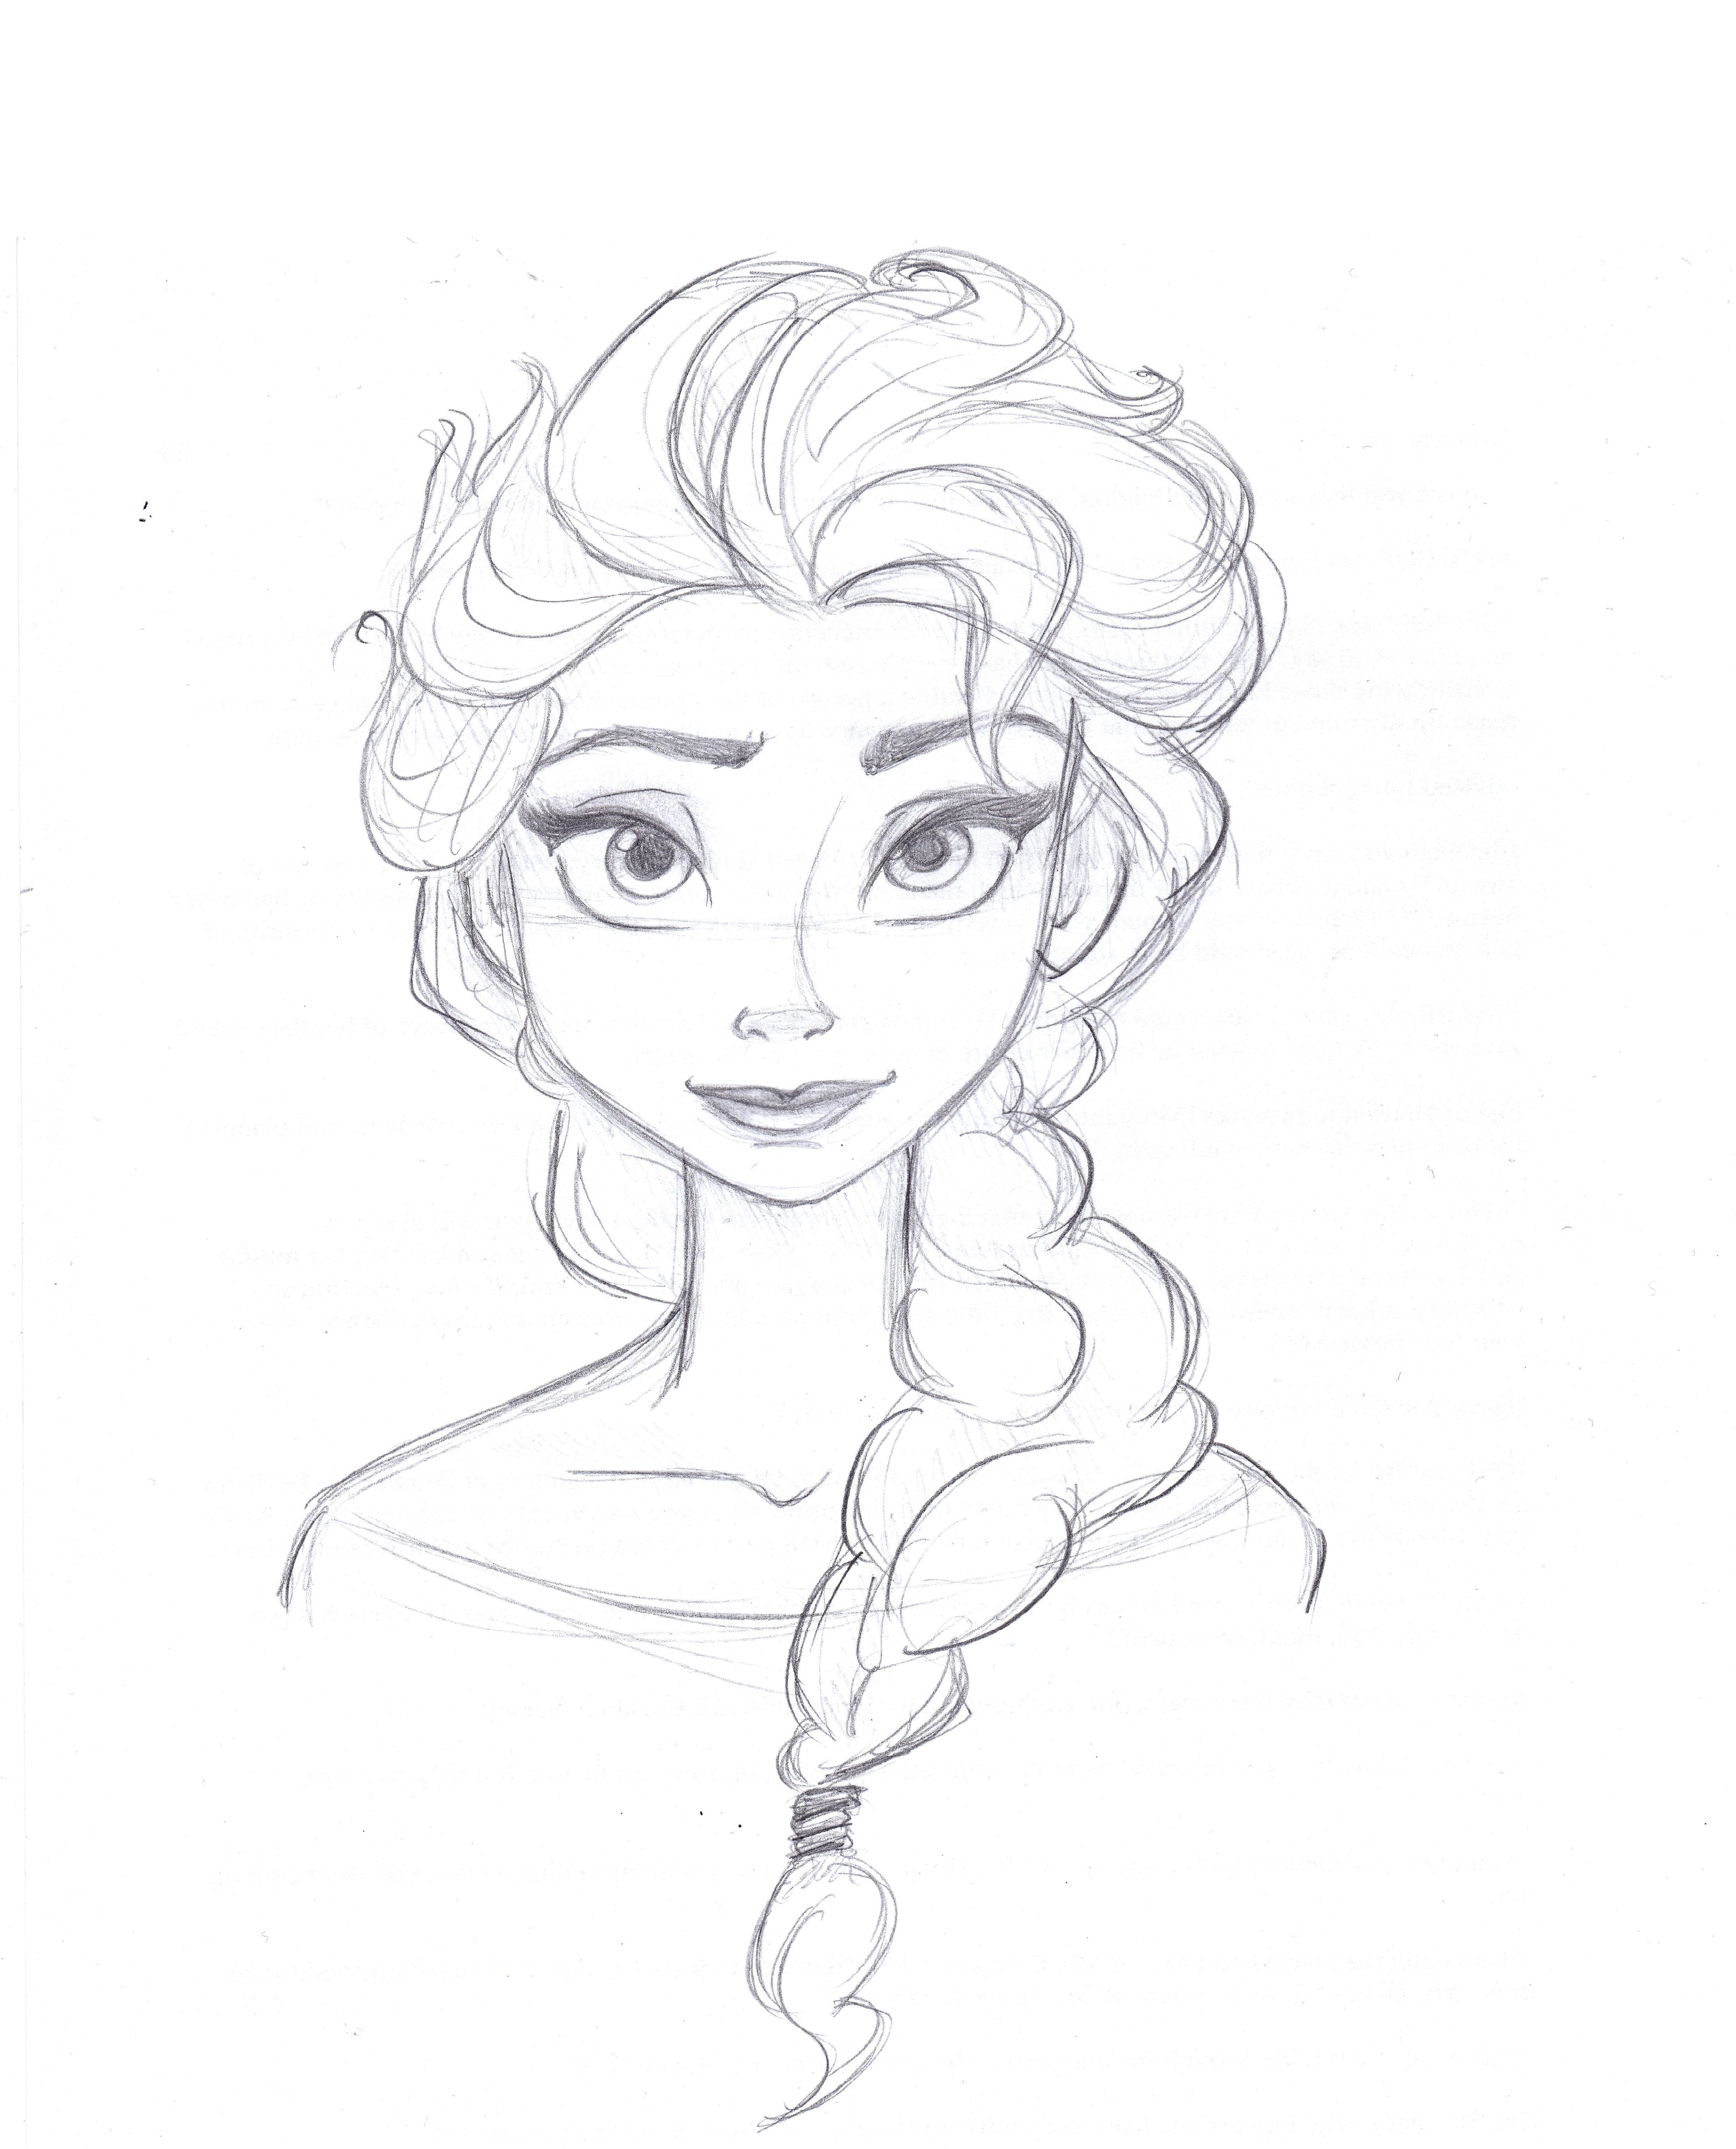 4960x6139 Elsa From Frozen Art By Anna Helena Elsa, Drawings